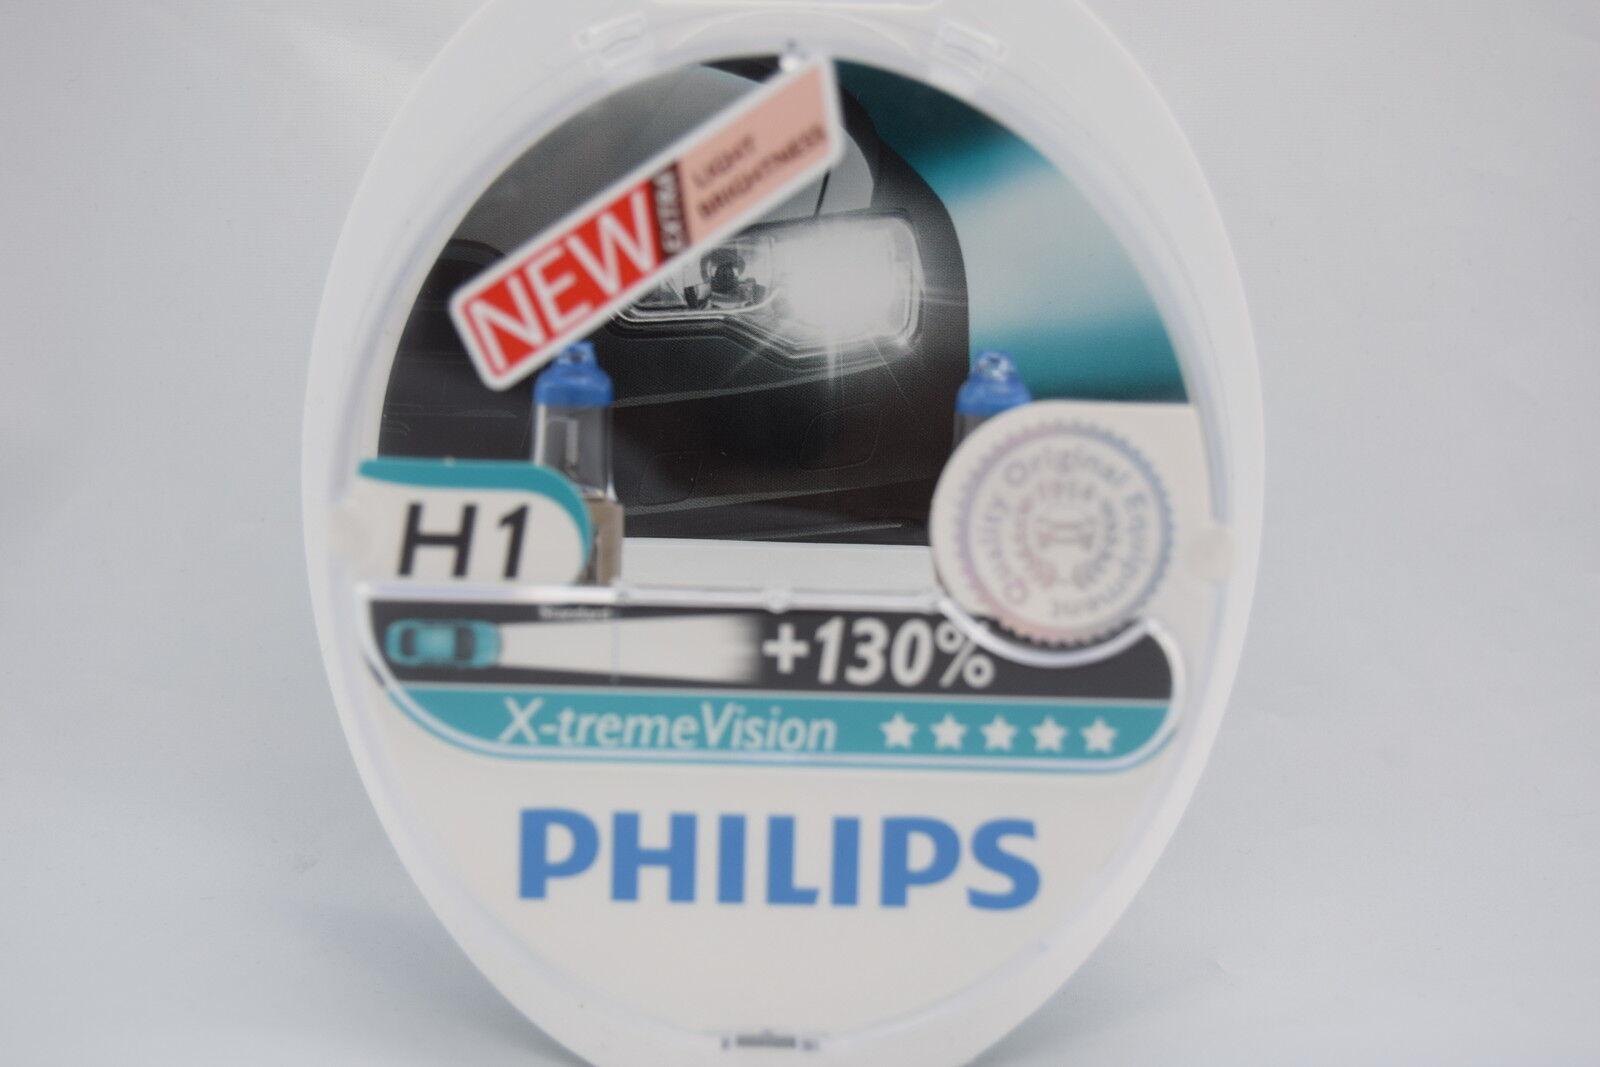 FITS ALFA ROMEO 155 1992+H1 PHILIPS SET OF 2 NEW X-TREME VISION  HEADLIGHT BULBS